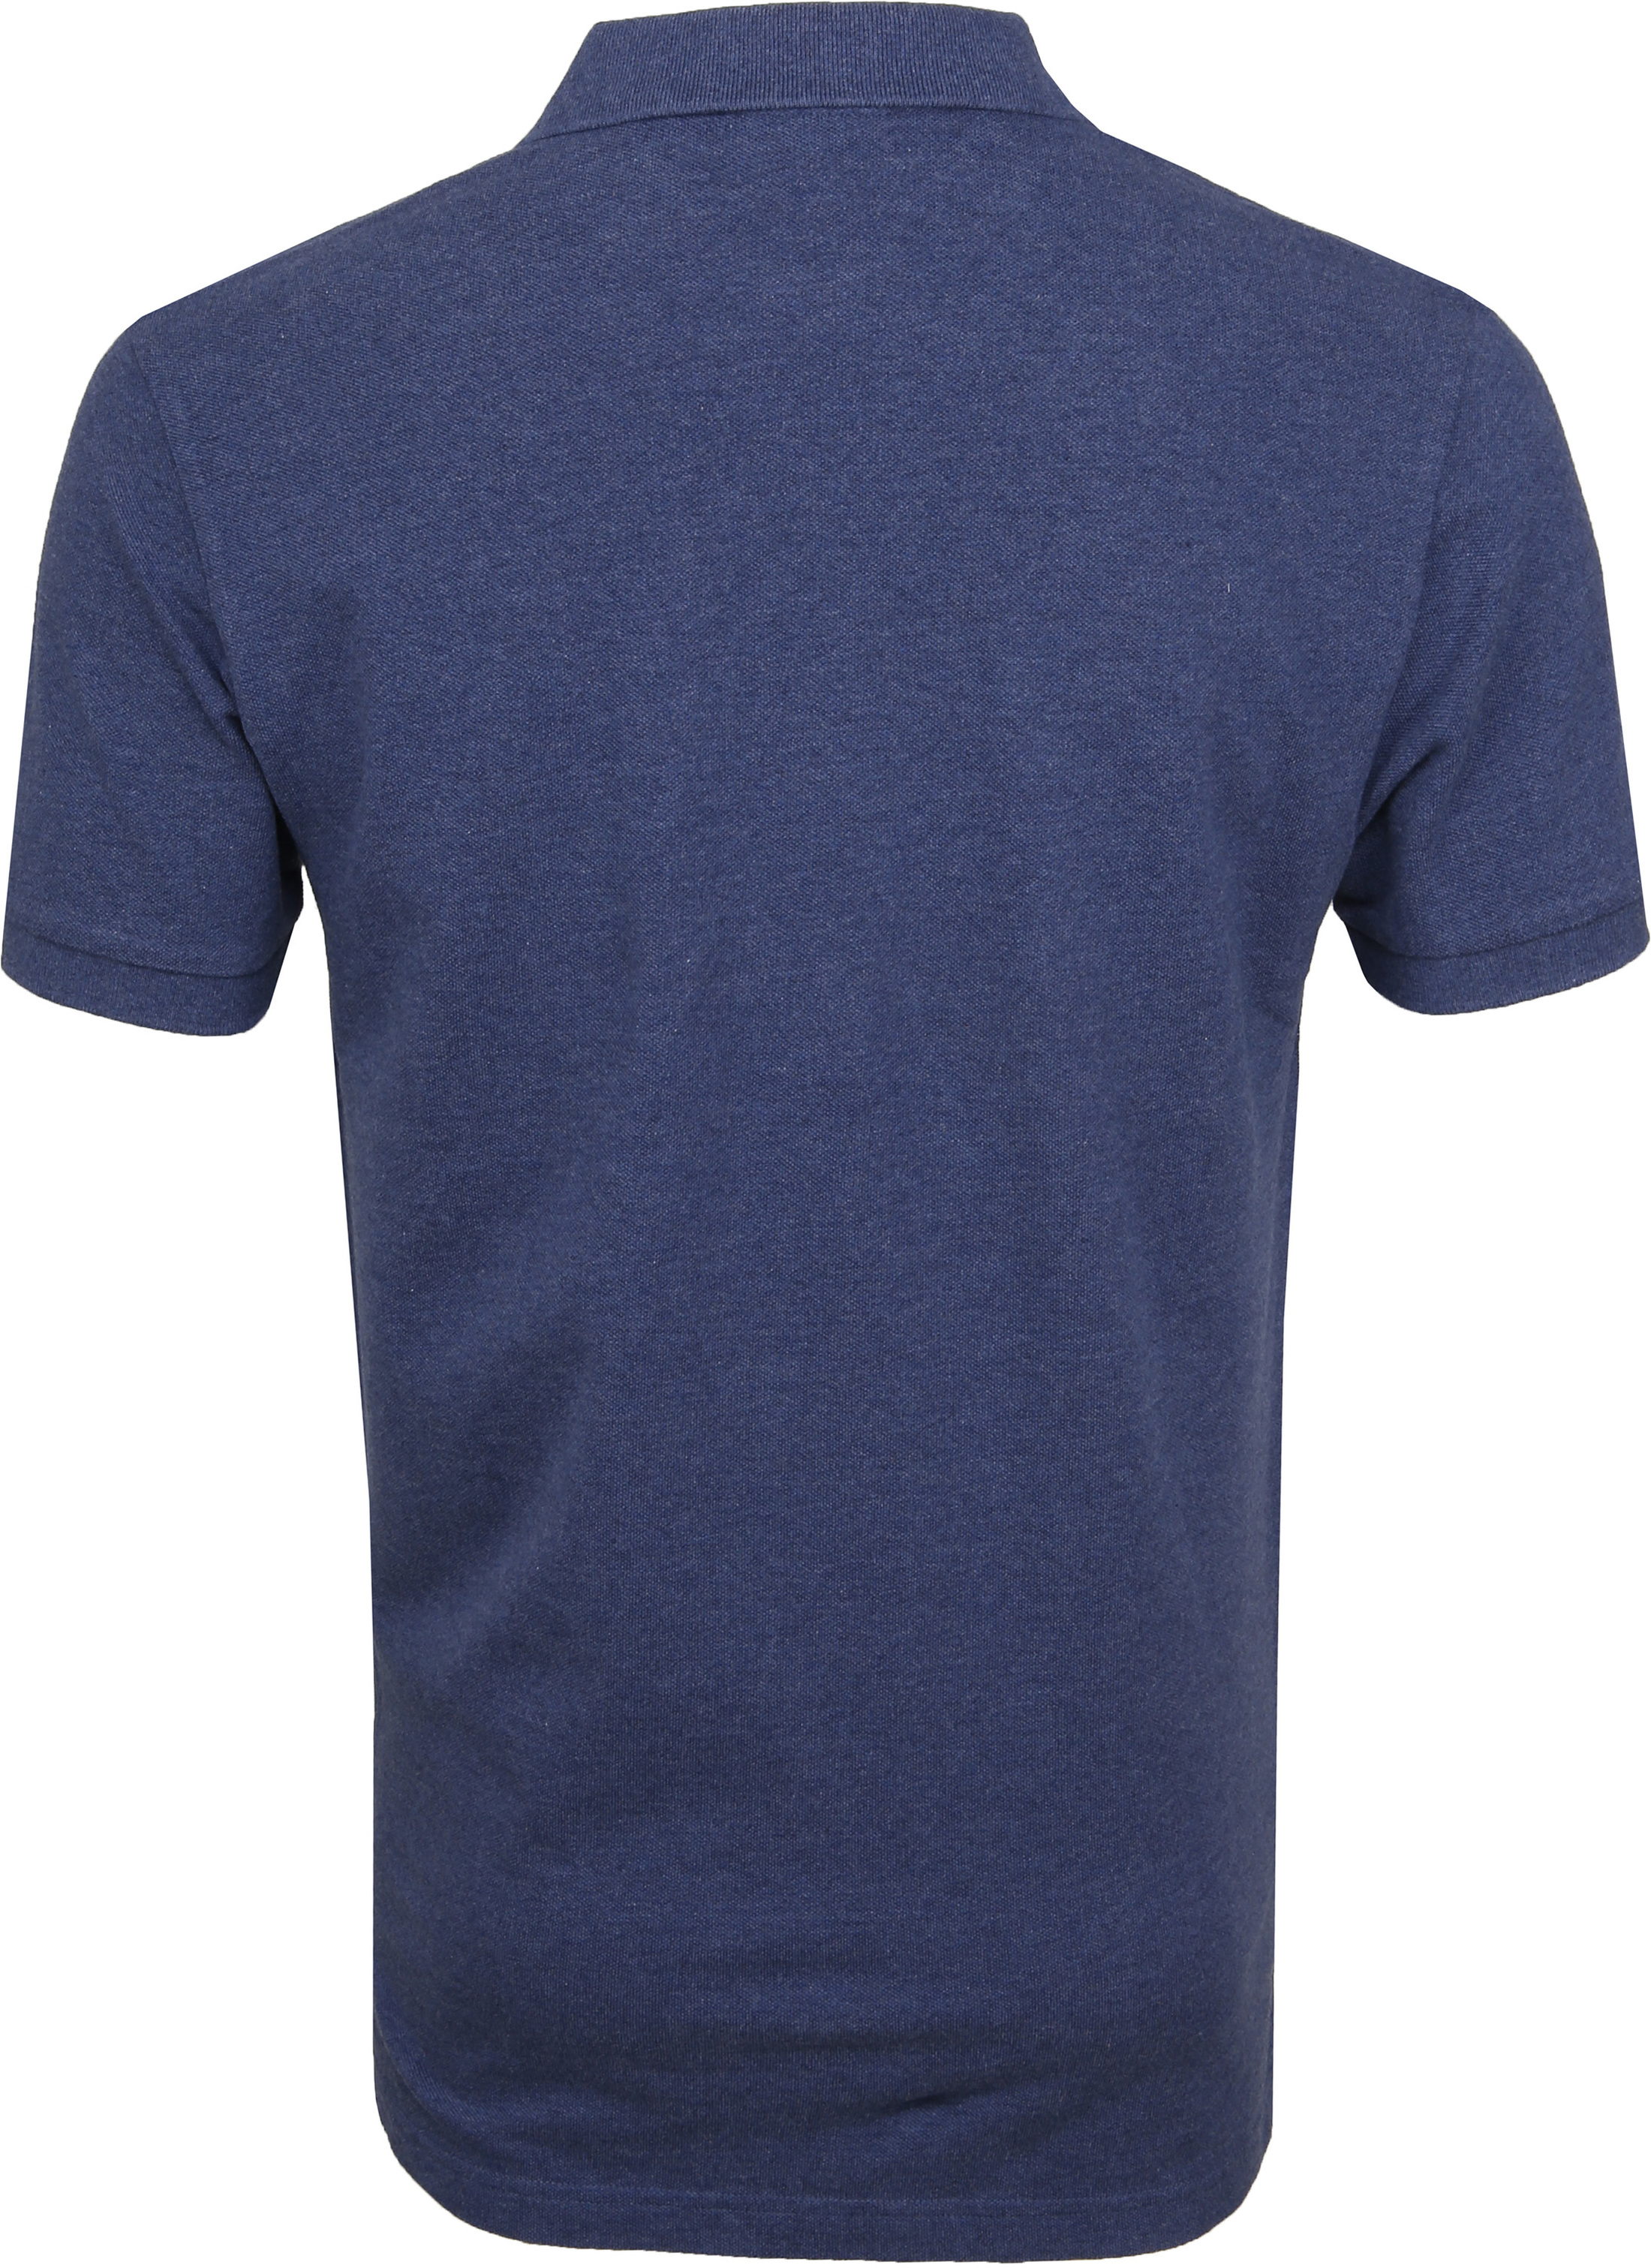 Profuomo Short Sleeve Poloshirt Indigo foto 3